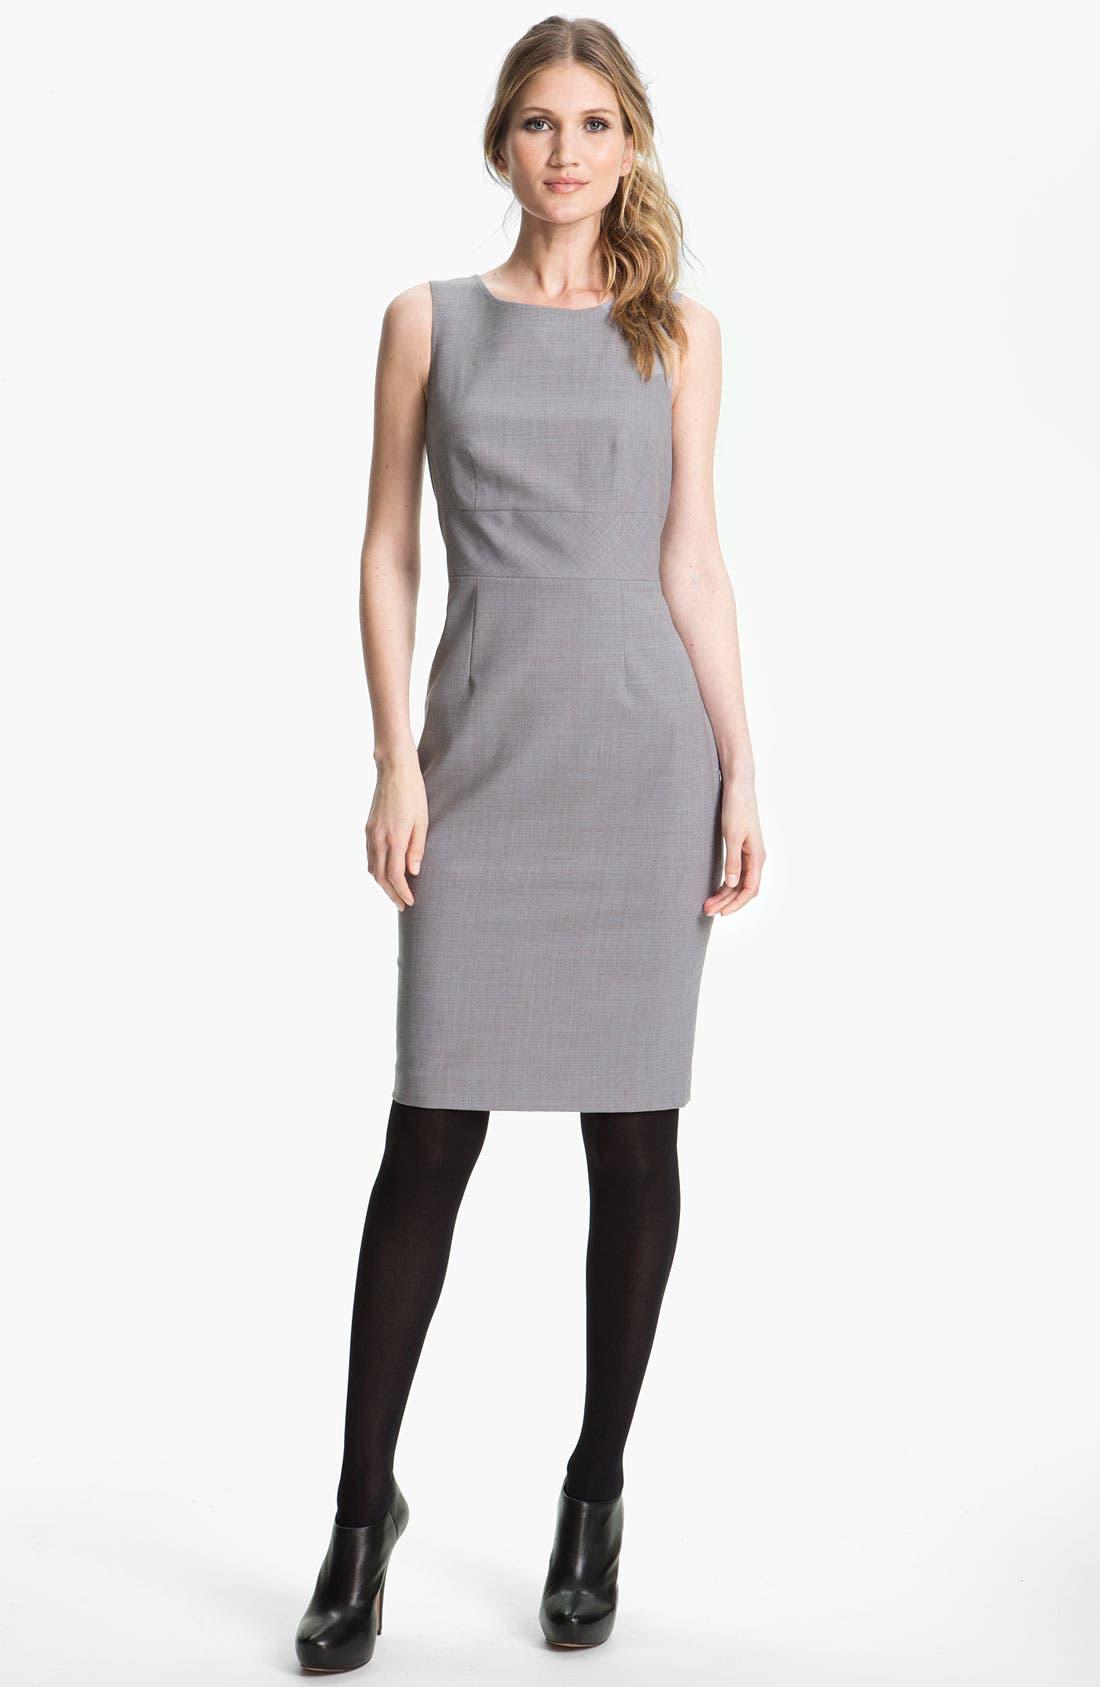 Main Image - Santorelli 'Luna' Dress